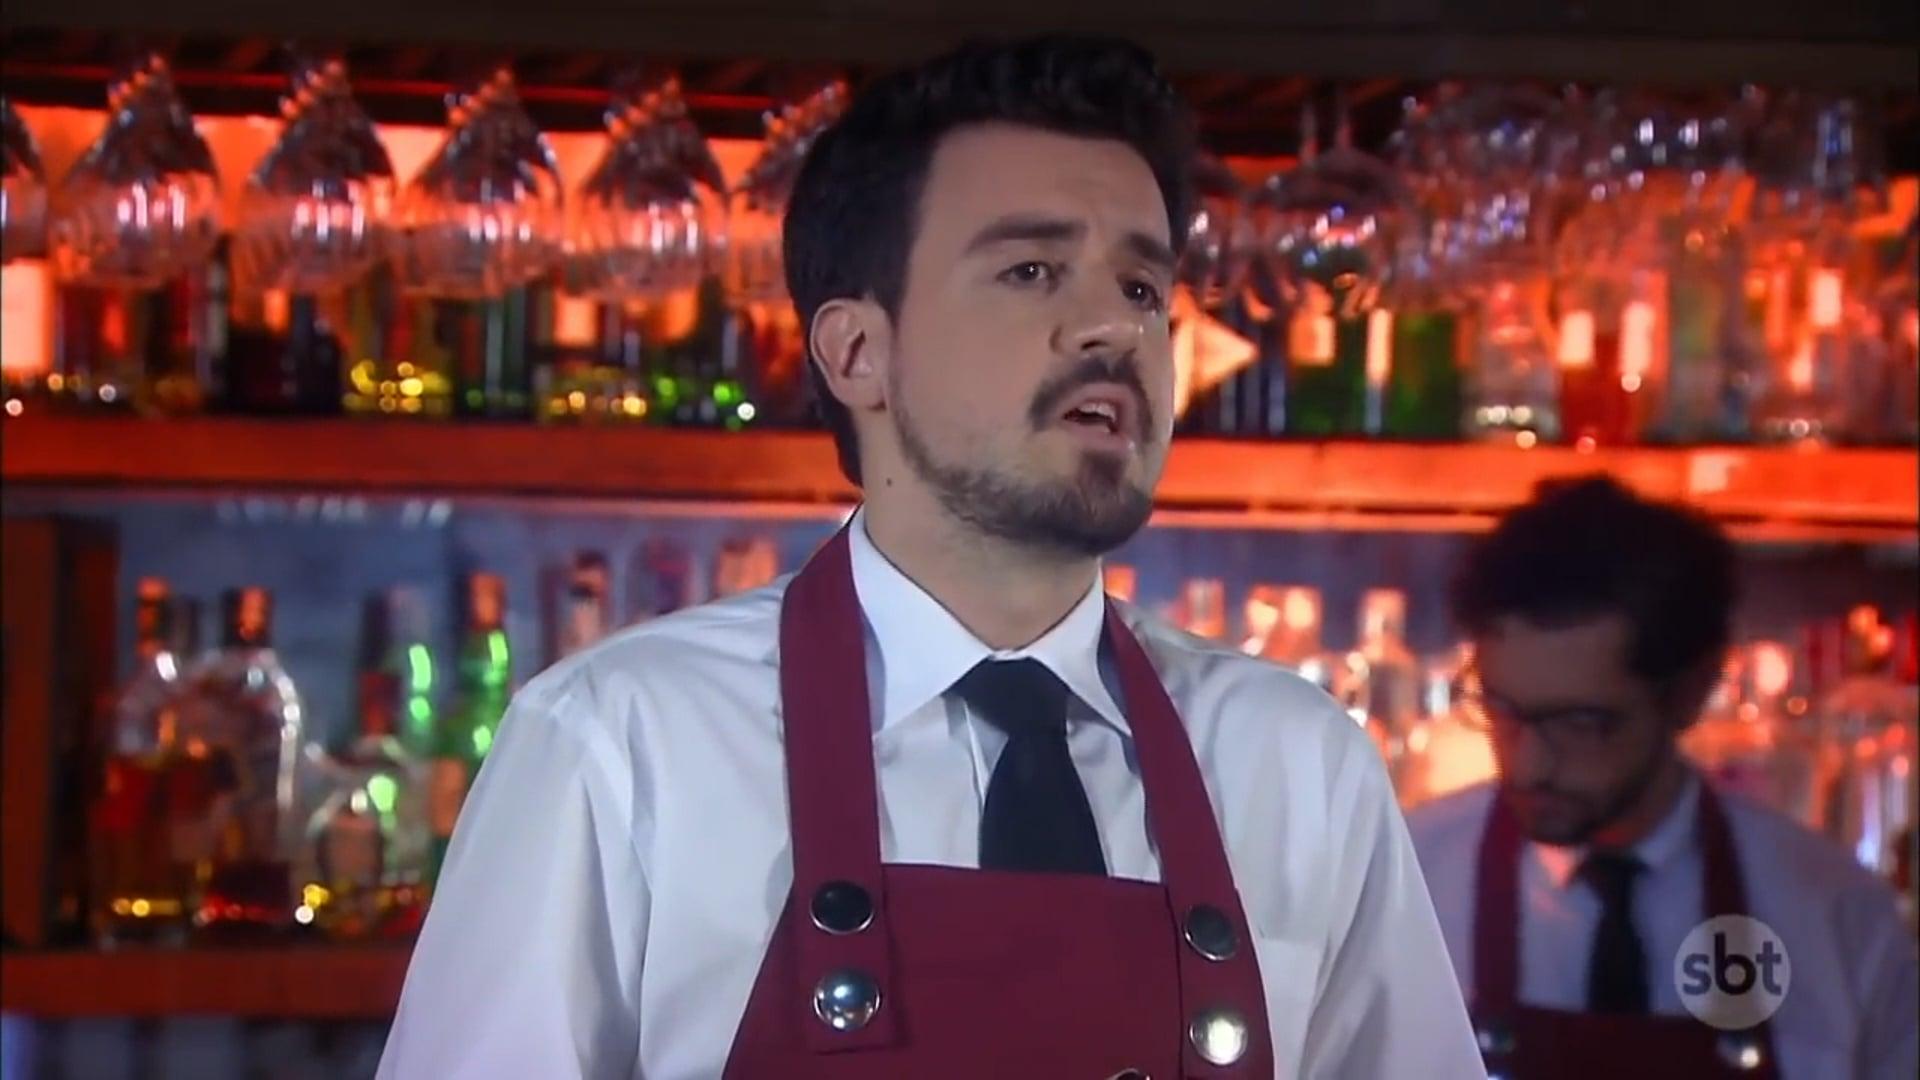 Recorte de Cena - Novela - 2018